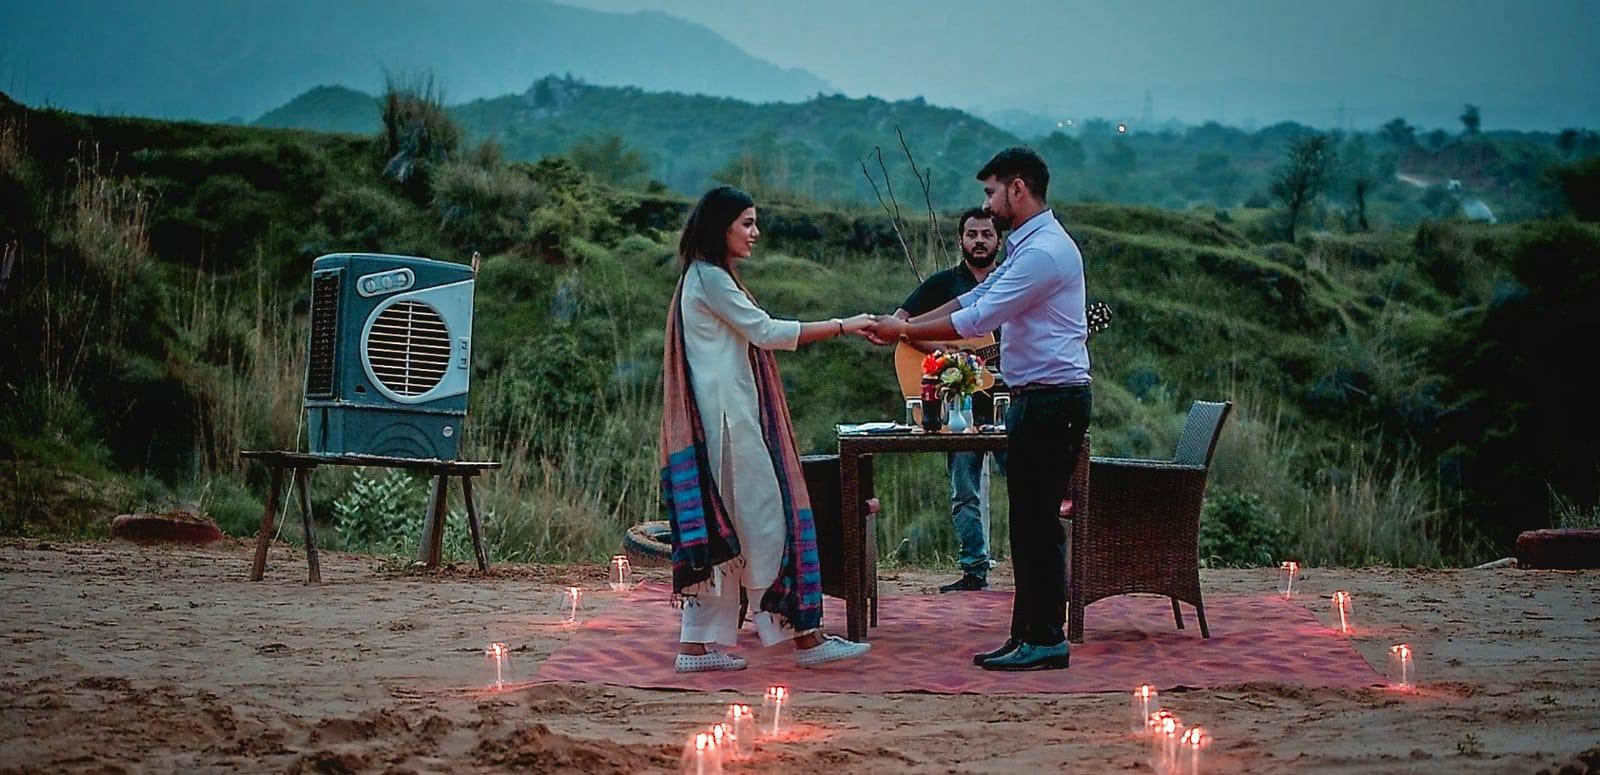 Kostenloses Dating in jaipur